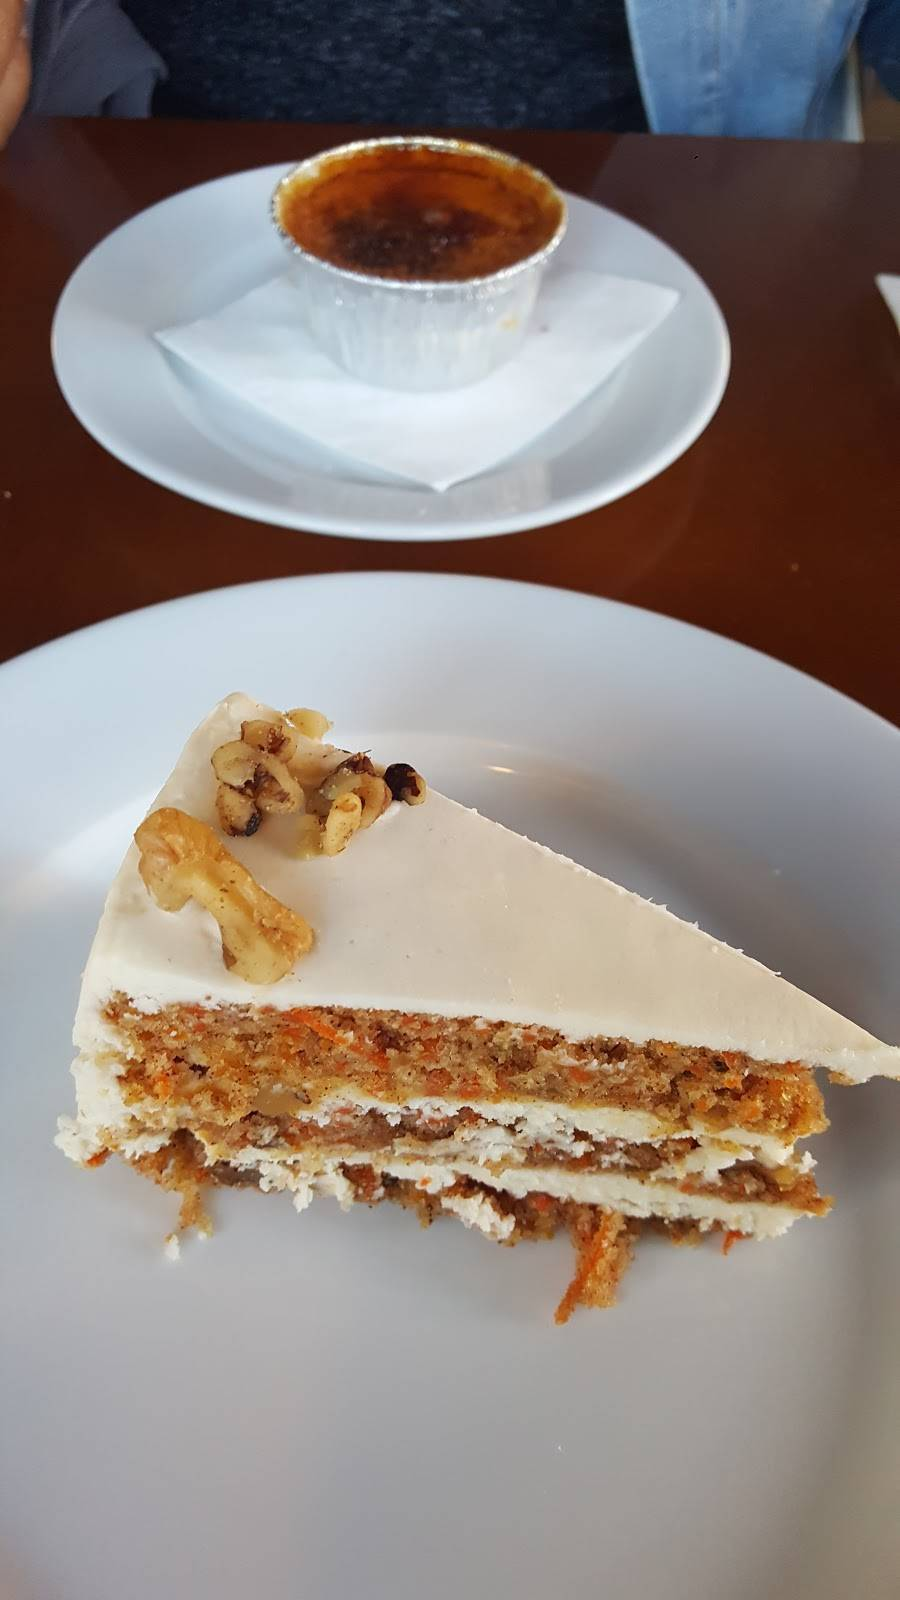 Aubergine Cafe | cafe | 49-22 Skillman Ave, Woodside, NY 11377, USA | 7188991735 OR +1 718-899-1735